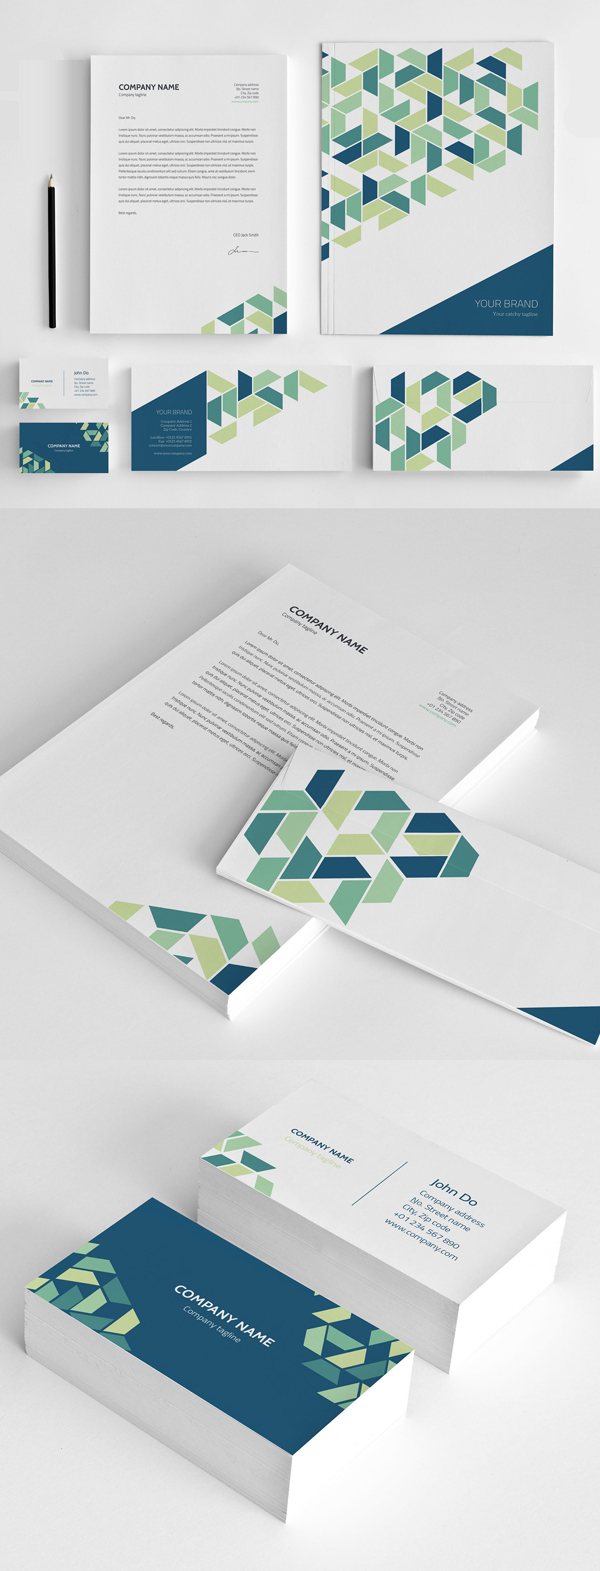 Modern Business Branding / Stationery Templates Design - 5